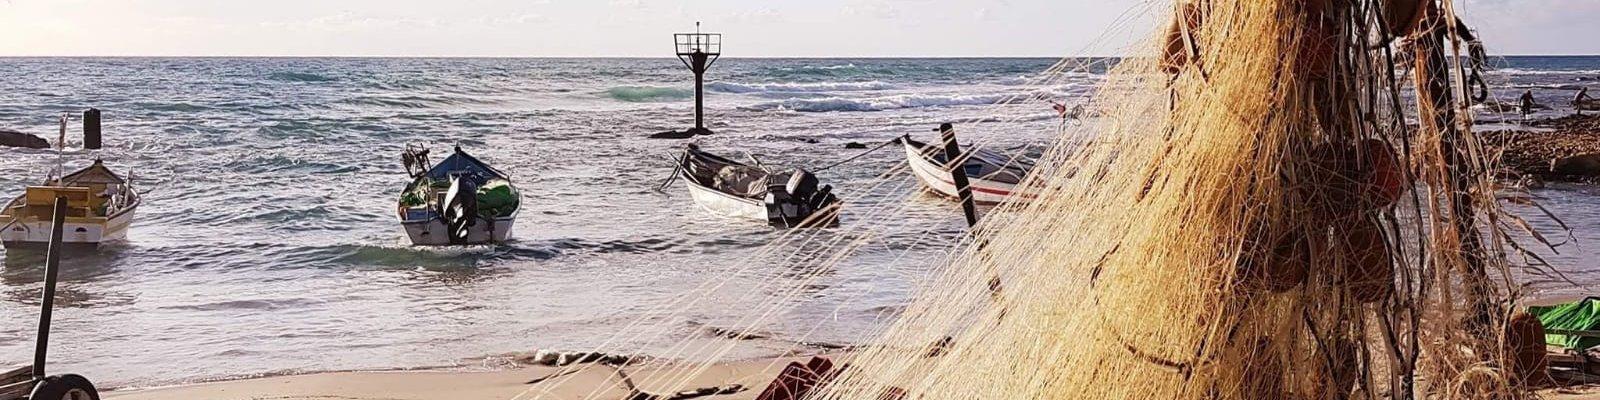 fisherman-jisr